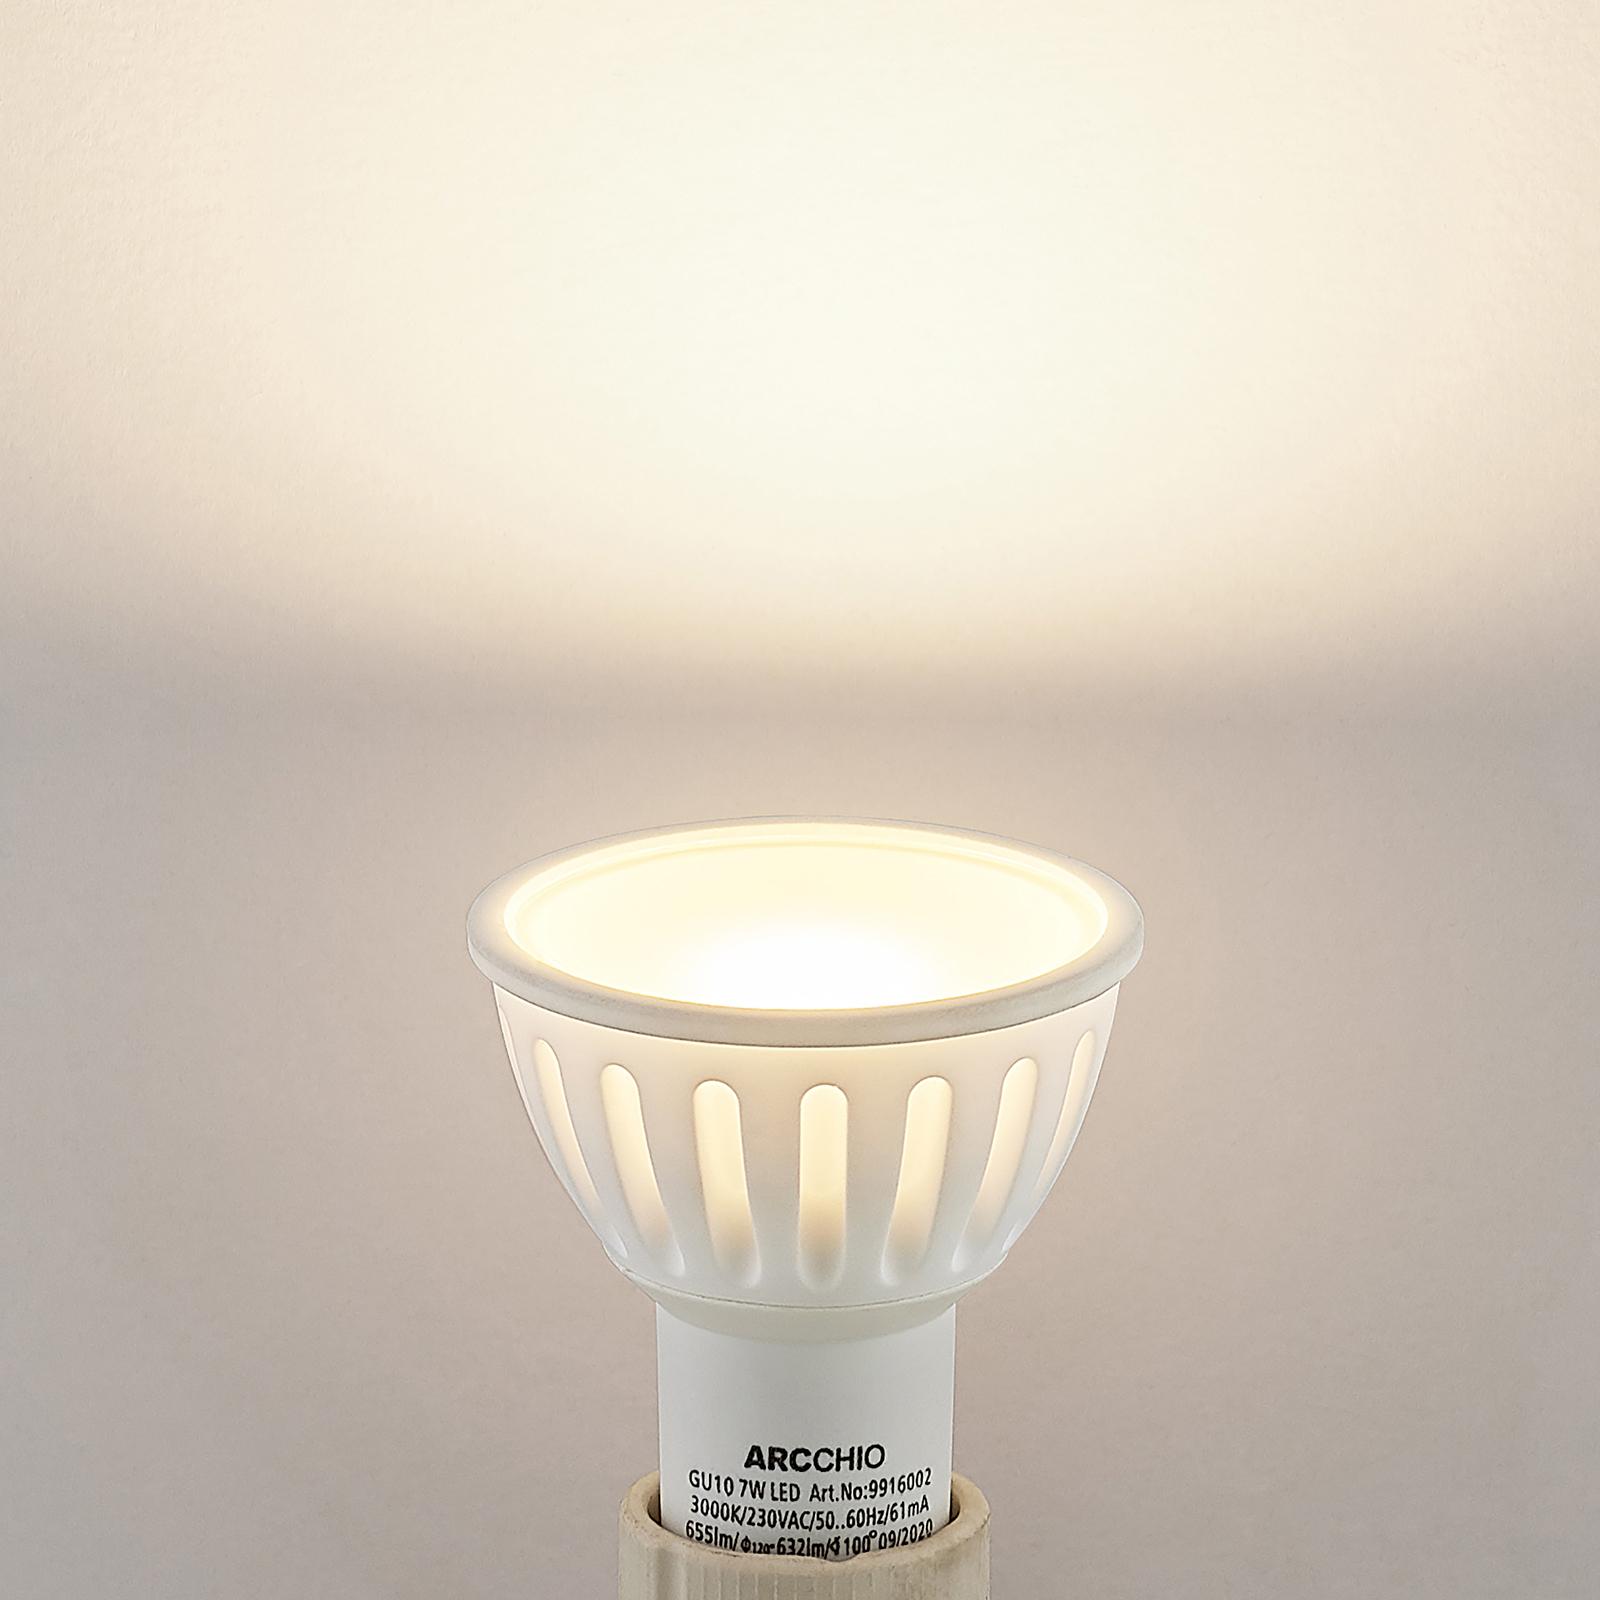 Arcchio-LED-heljastinlamppu GU10 100° 7W 3 000 K